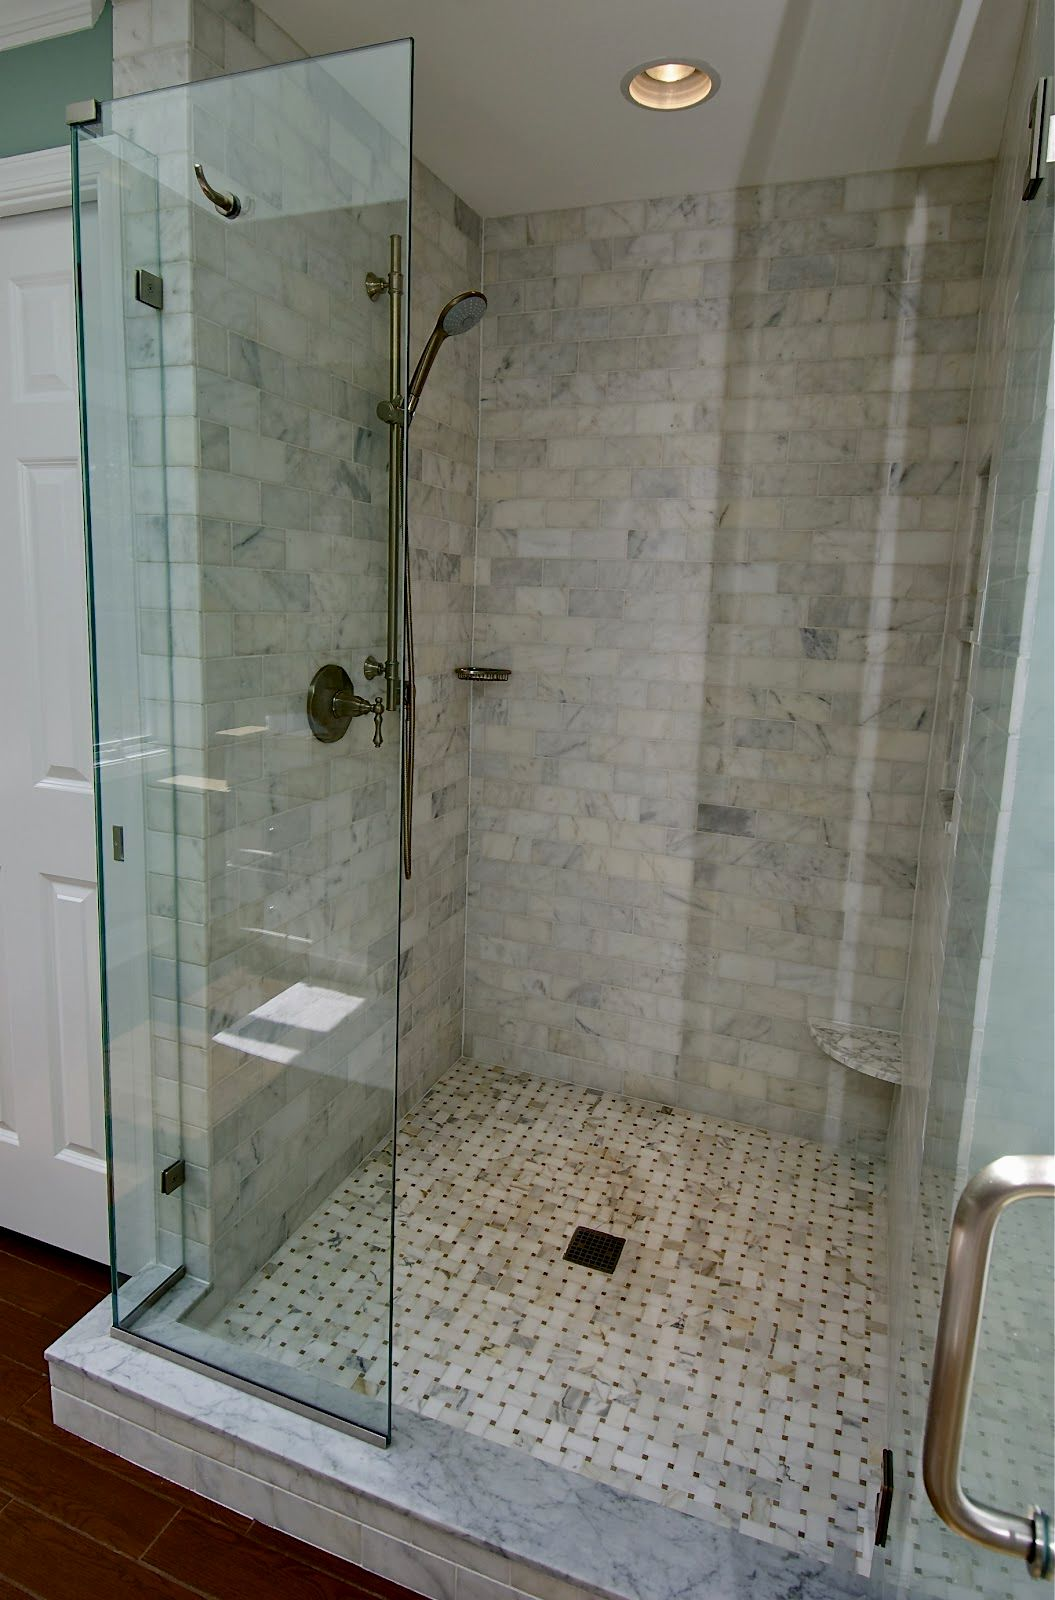 best of modern faucet bathroom ideas-Lovely Modern Faucet Bathroom Wallpaper